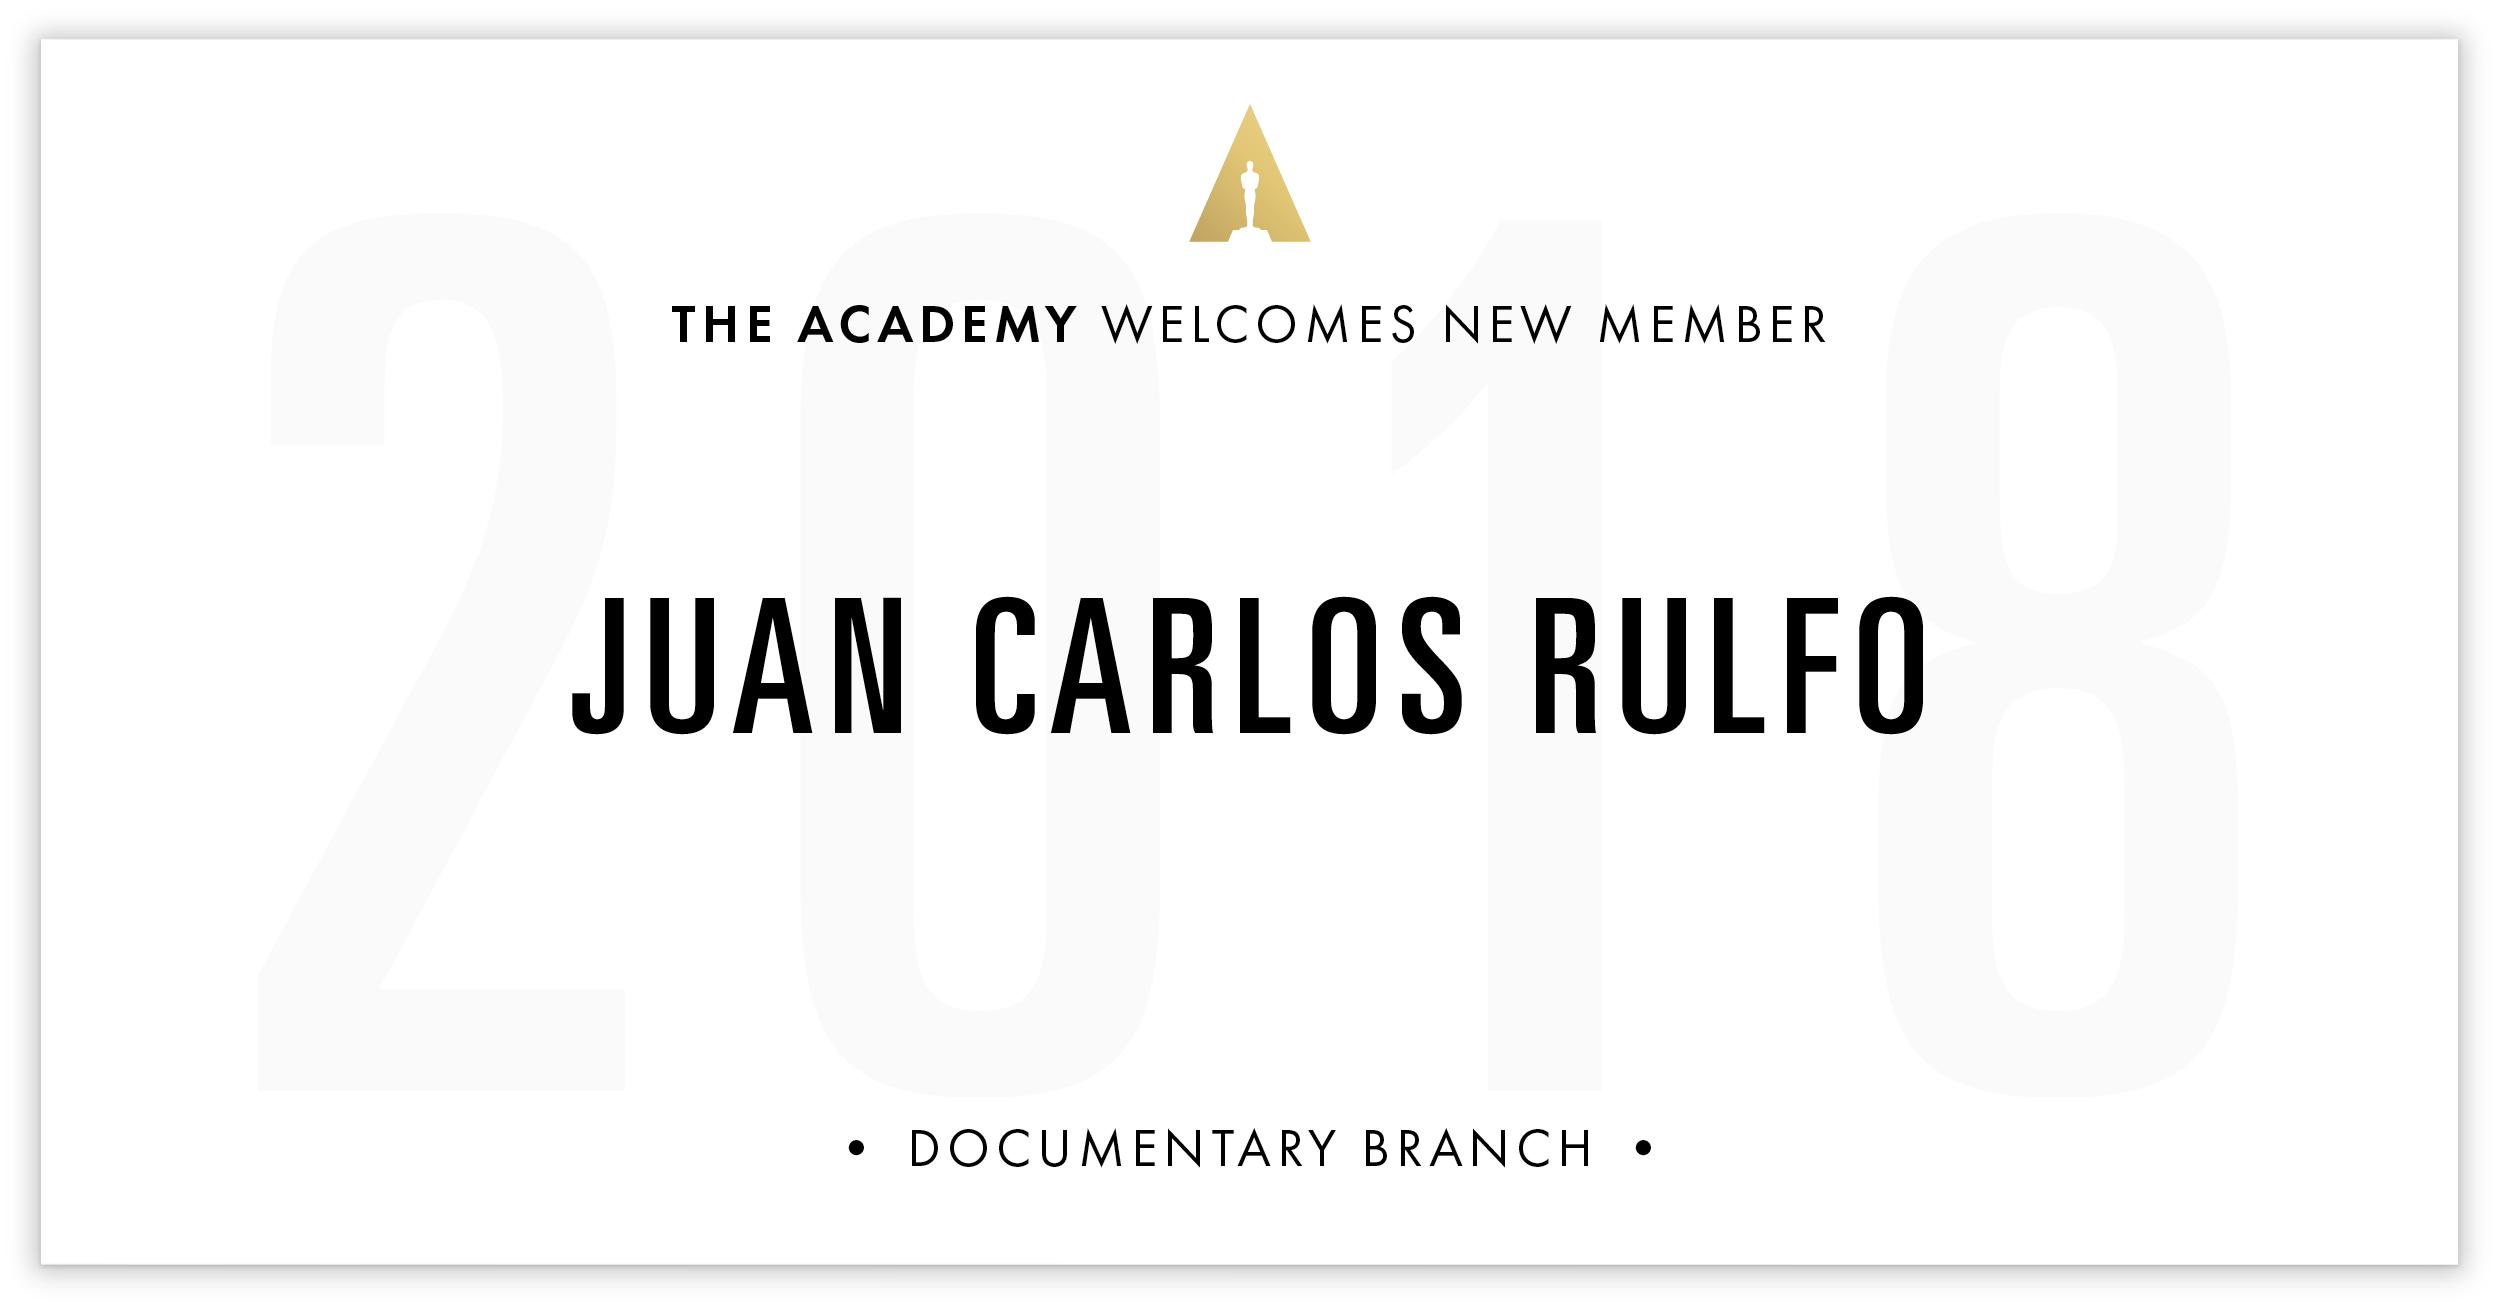 Juan Carlos Rulfo is invited!